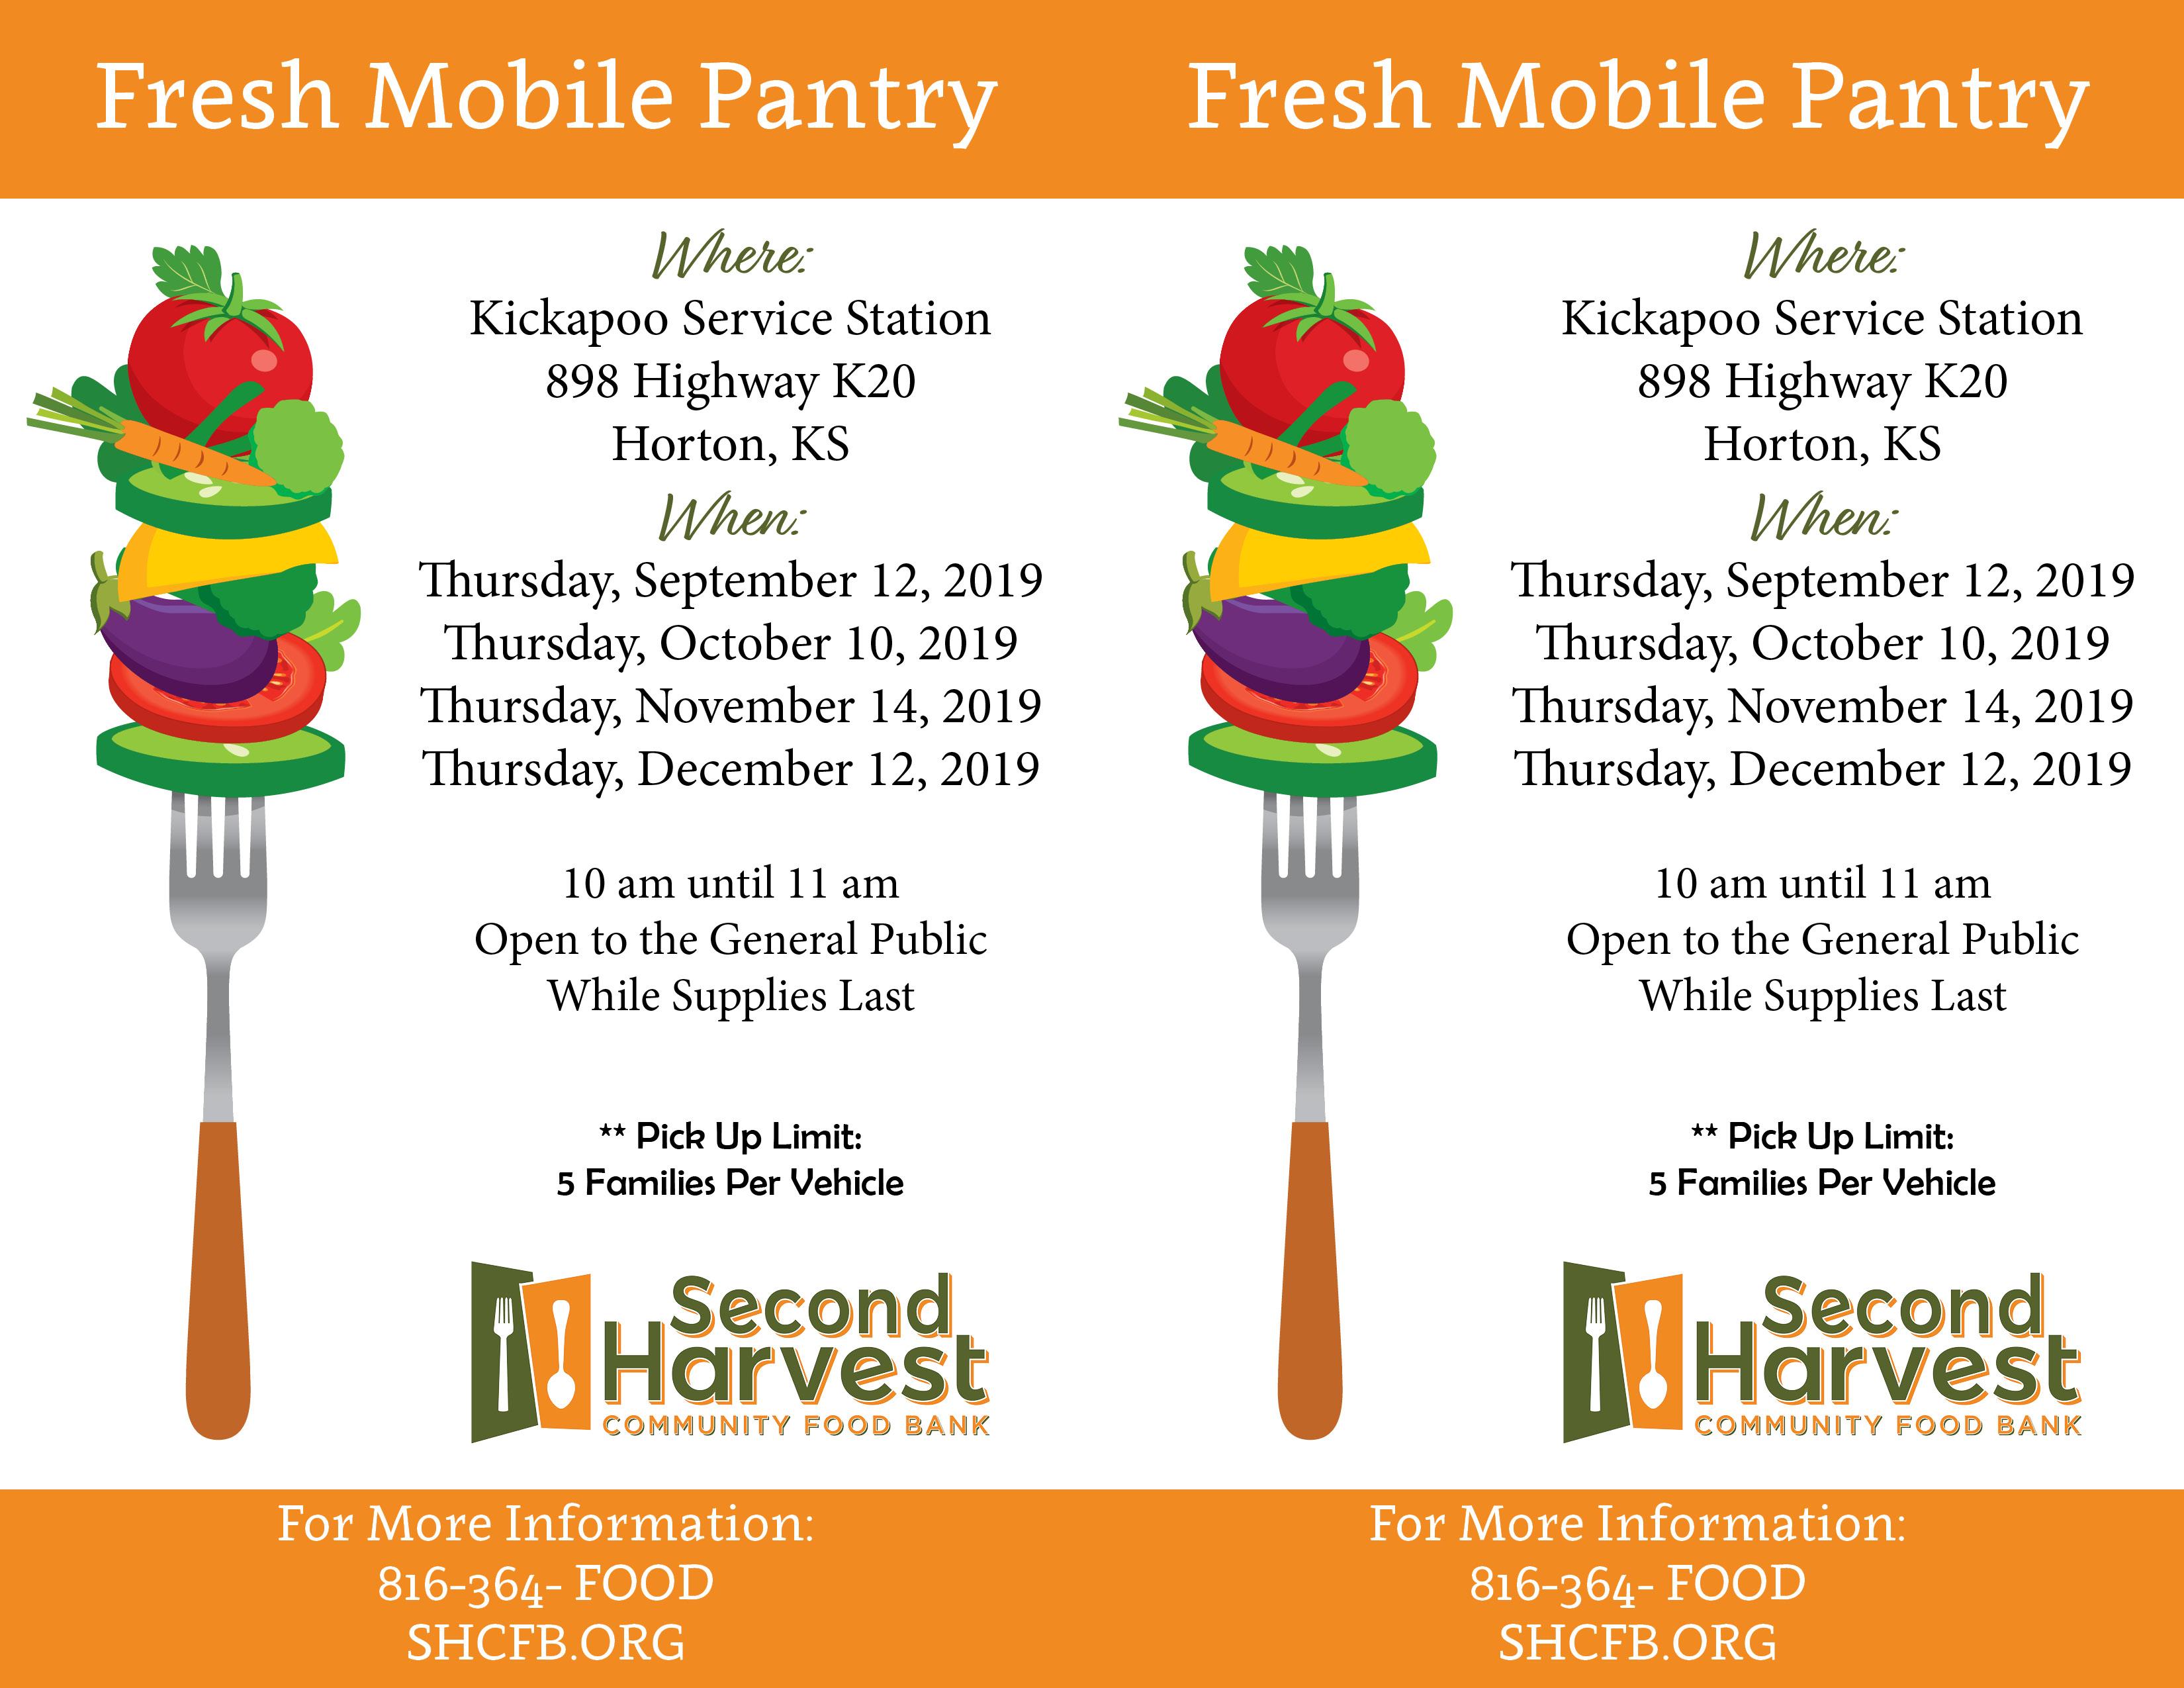 Kickapoo Fresh Mobile Pantry